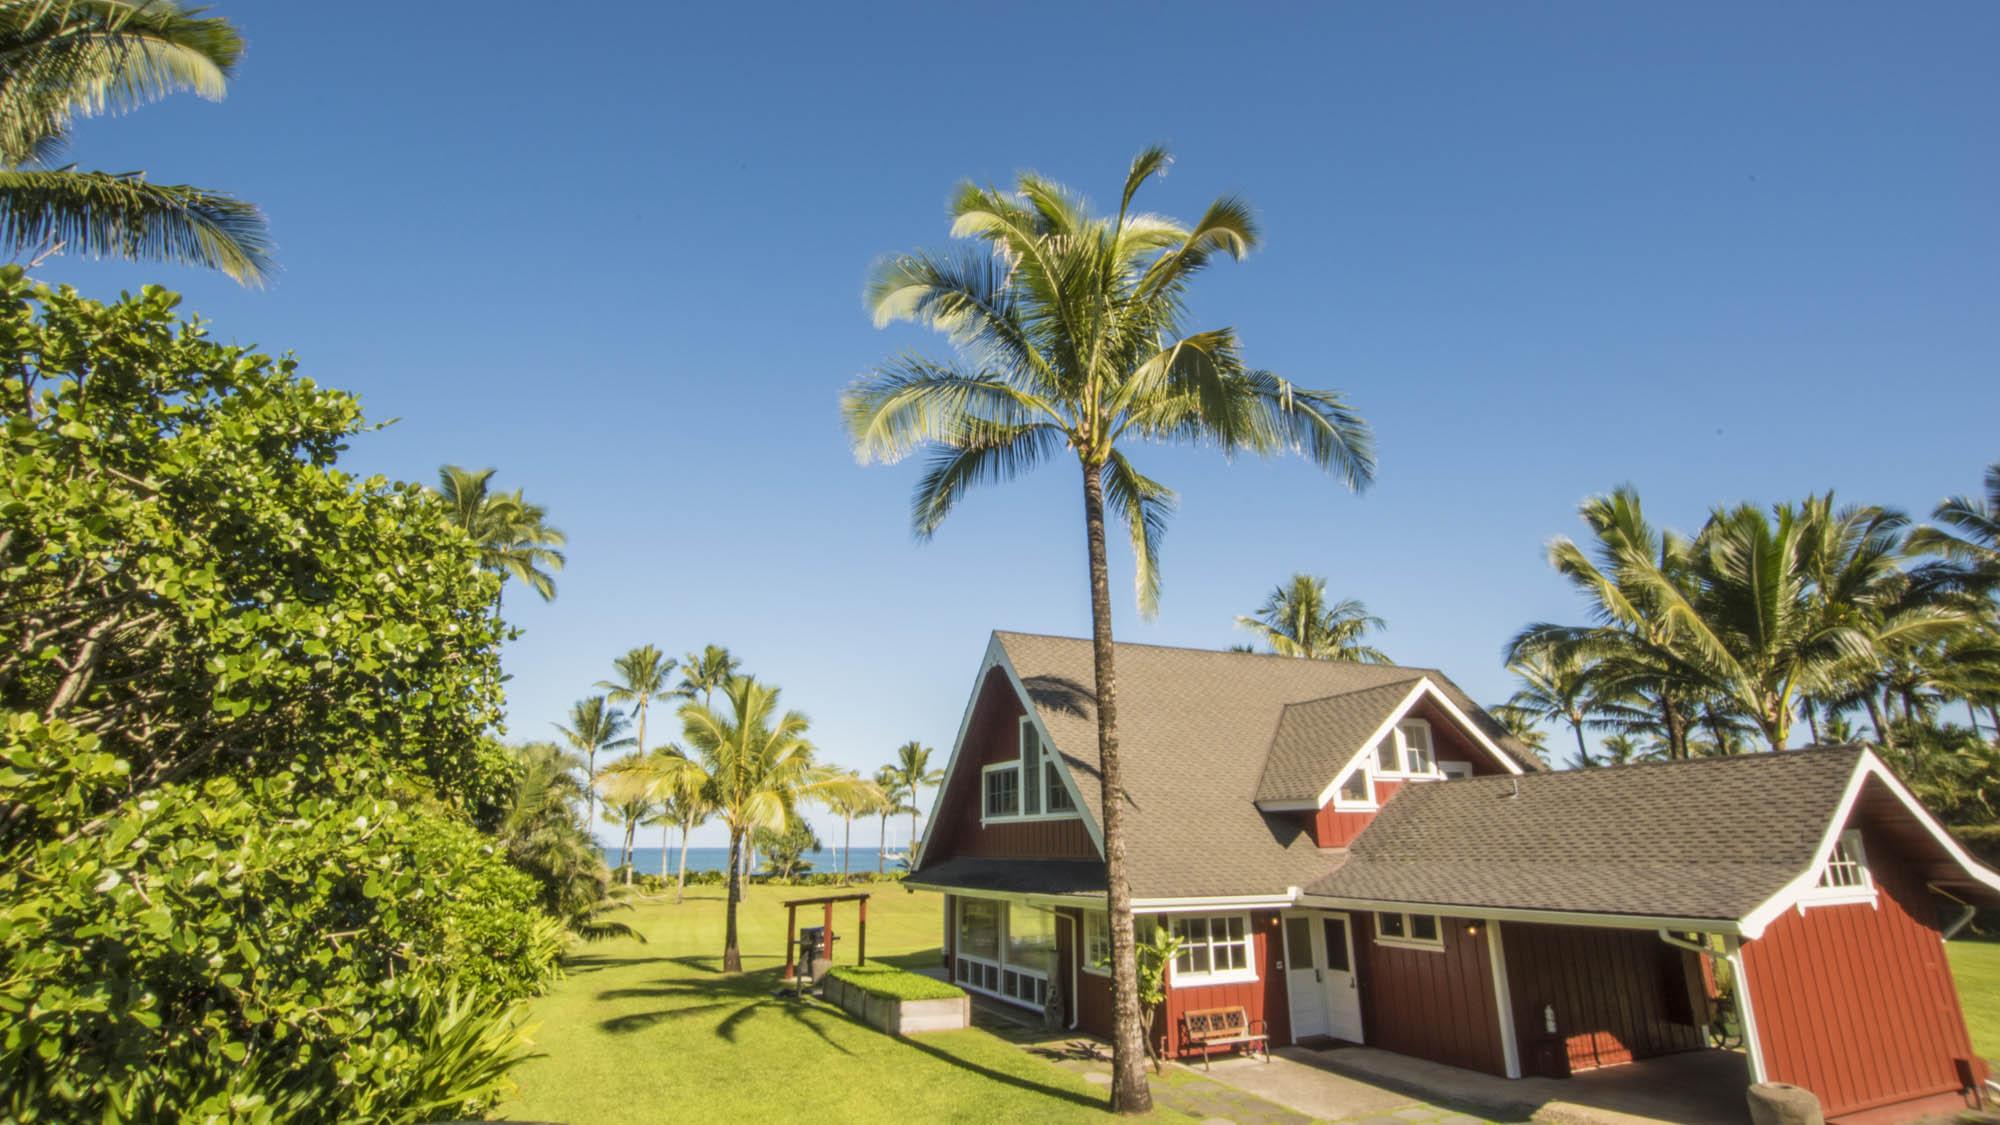 Kauai-217-Hanalei Bay32